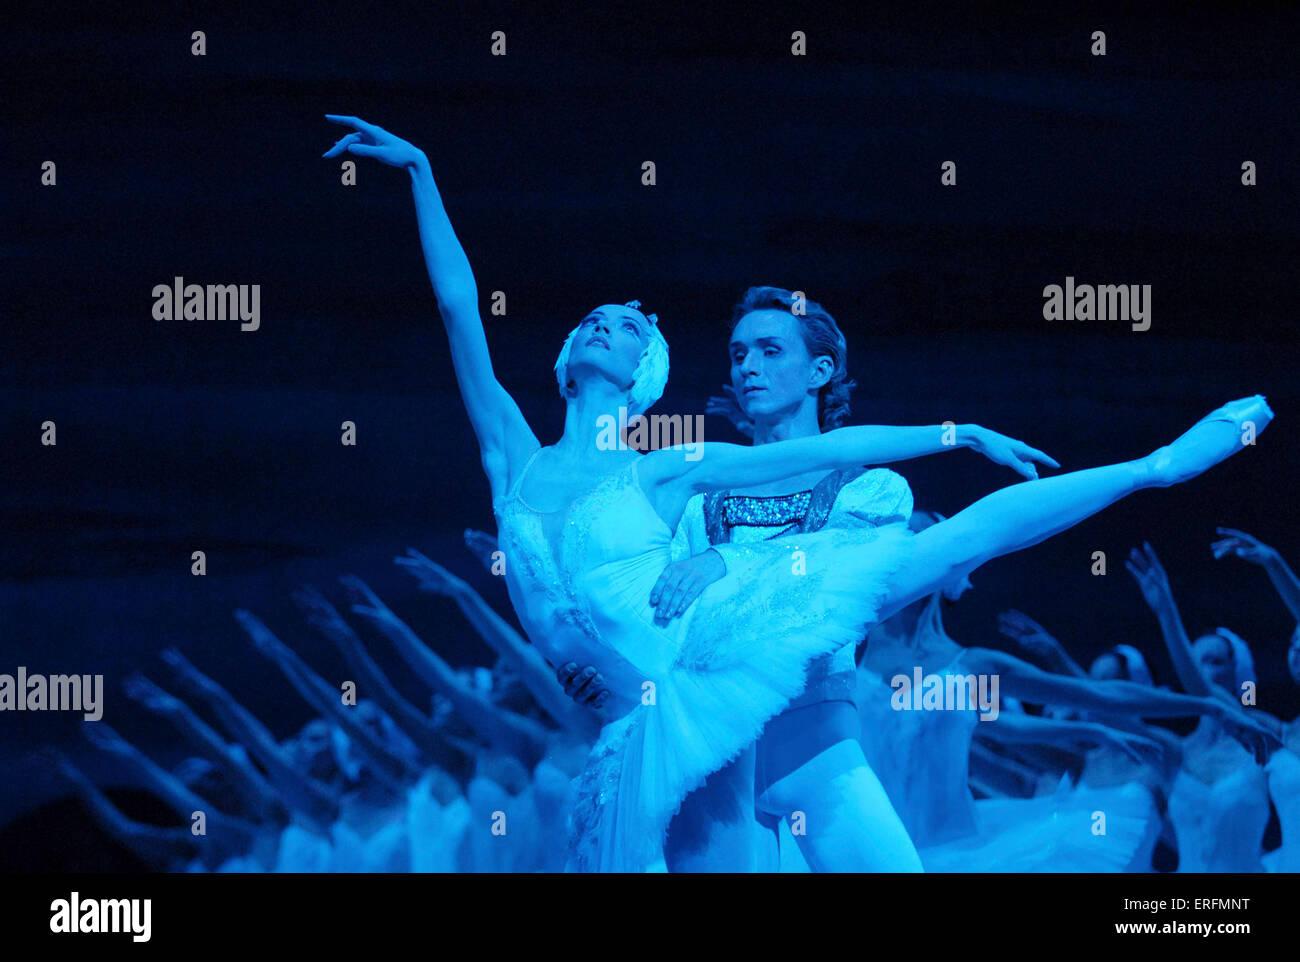 swan lake the eros ballet uncensored